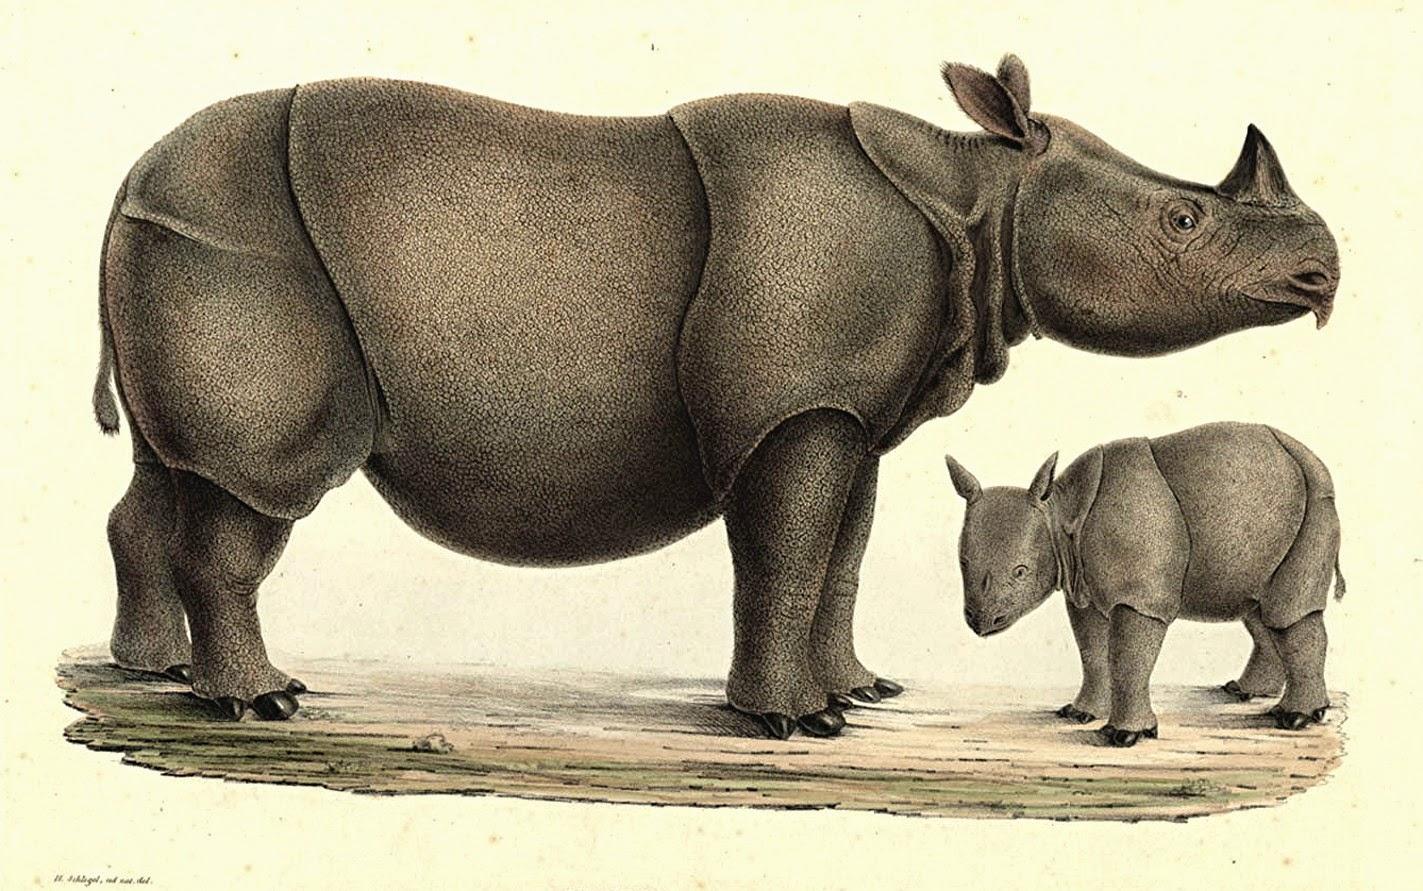 Drawn rhino javan rhino INDONESIA'S domain) as and An